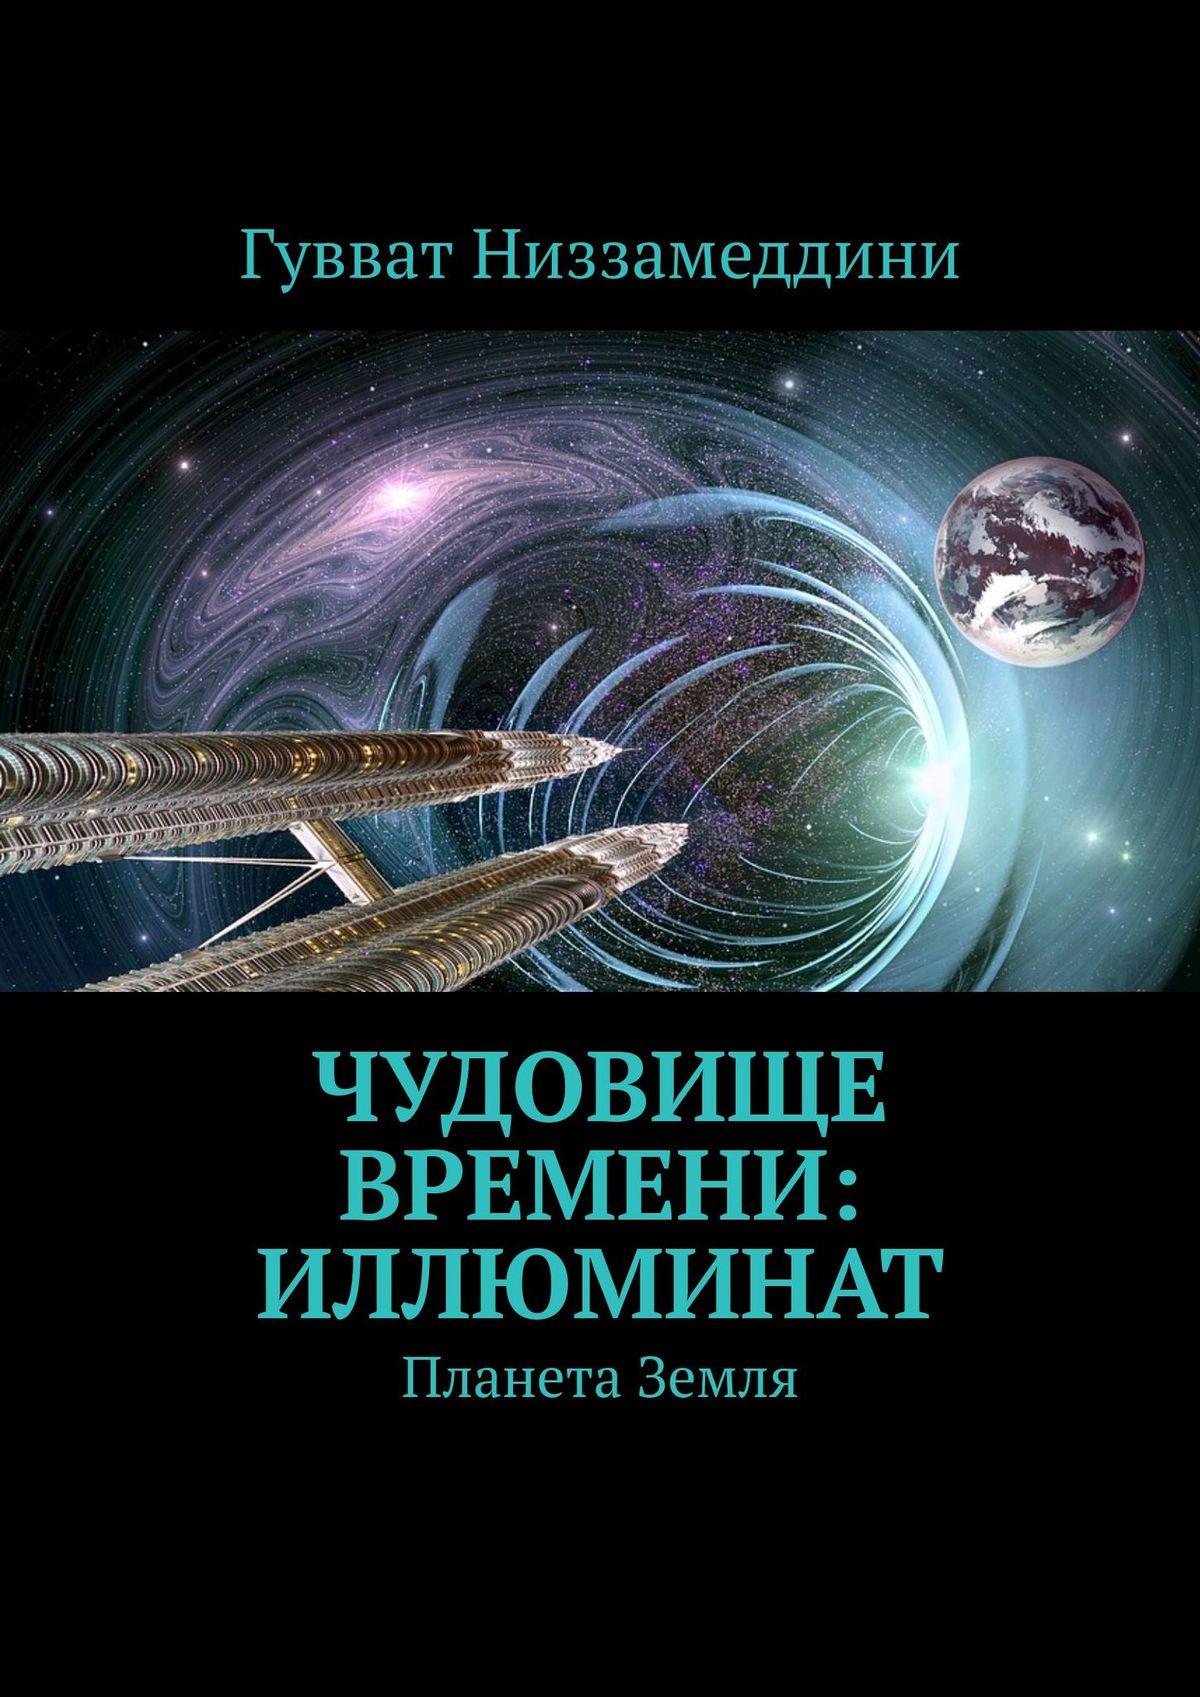 Гувват Низзамеддини Чудовище Времени: Иллюминат. Планета Земля гувват низзамеддини последний шанс или 10 минут до смерти